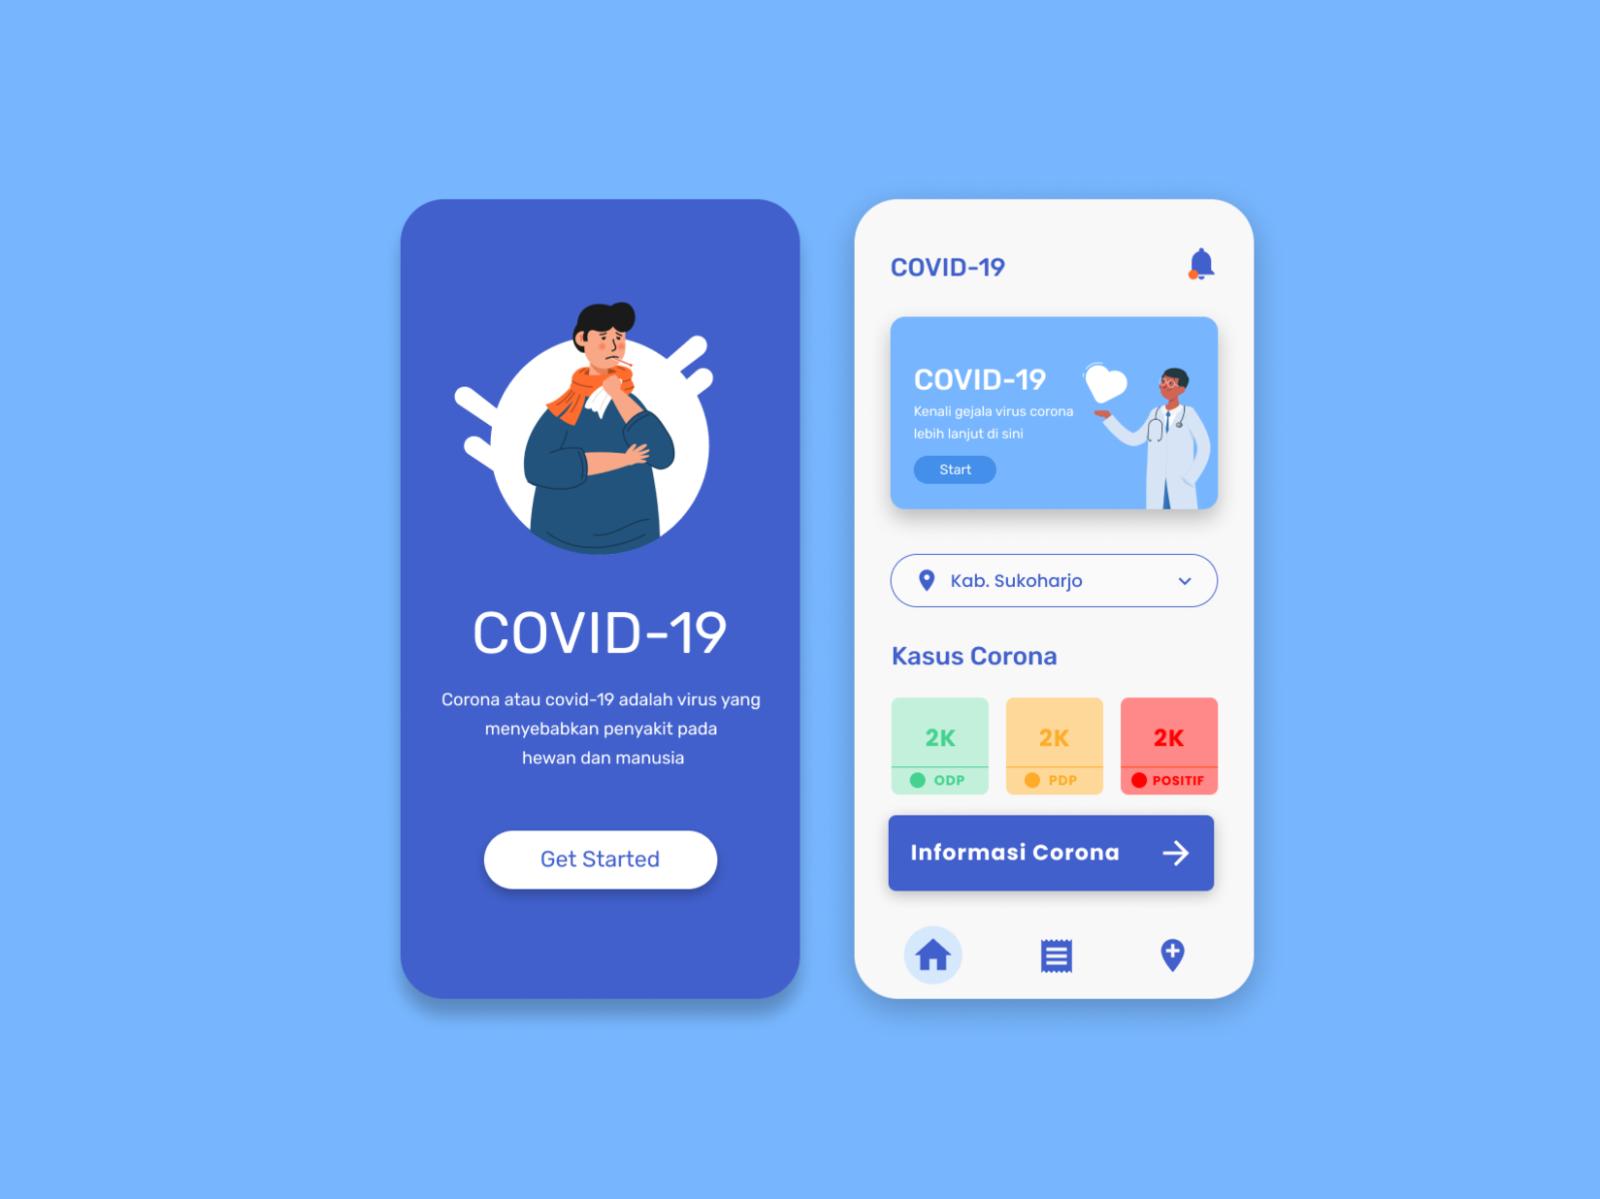 App Di Design covid - 19 app design by raihan muhammad on dribbble